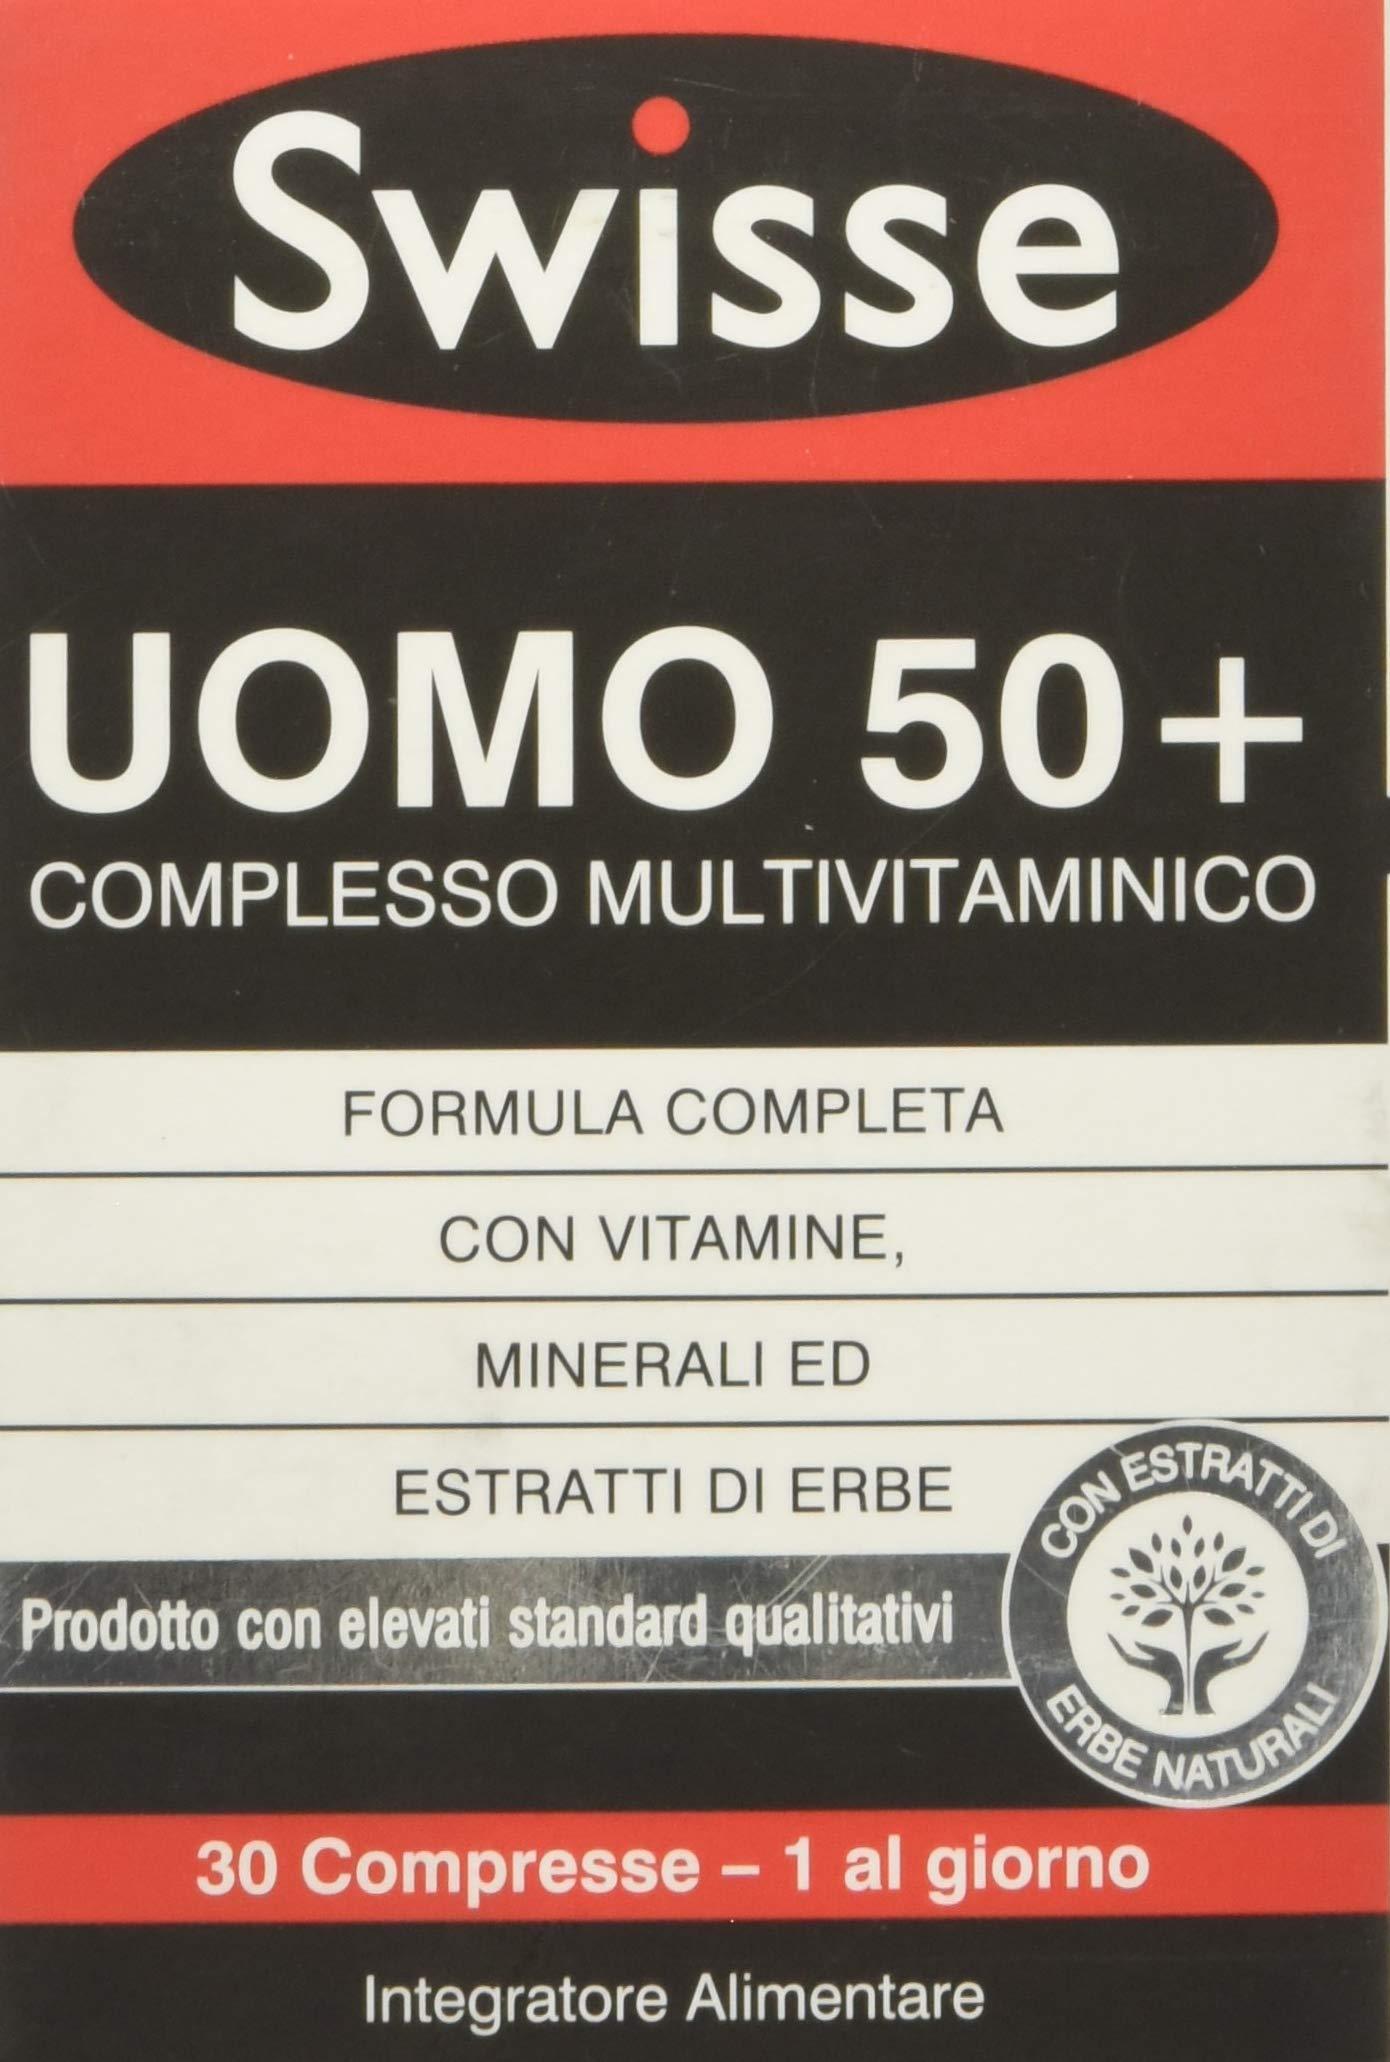 Swisse Multivitaminico Uomo 50+ - 30 Compresse 1 spesavip